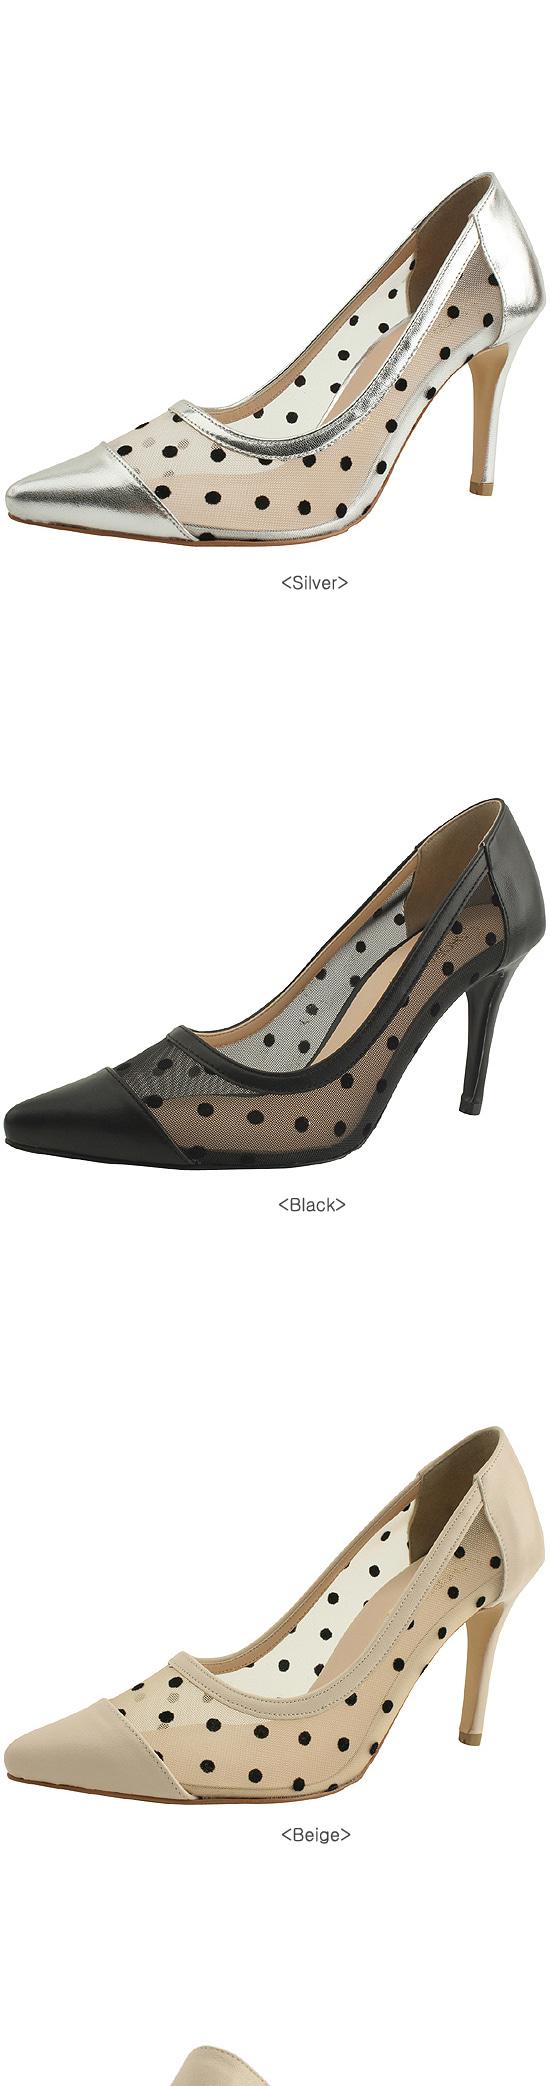 Lace stiletto high heels 9cm silver